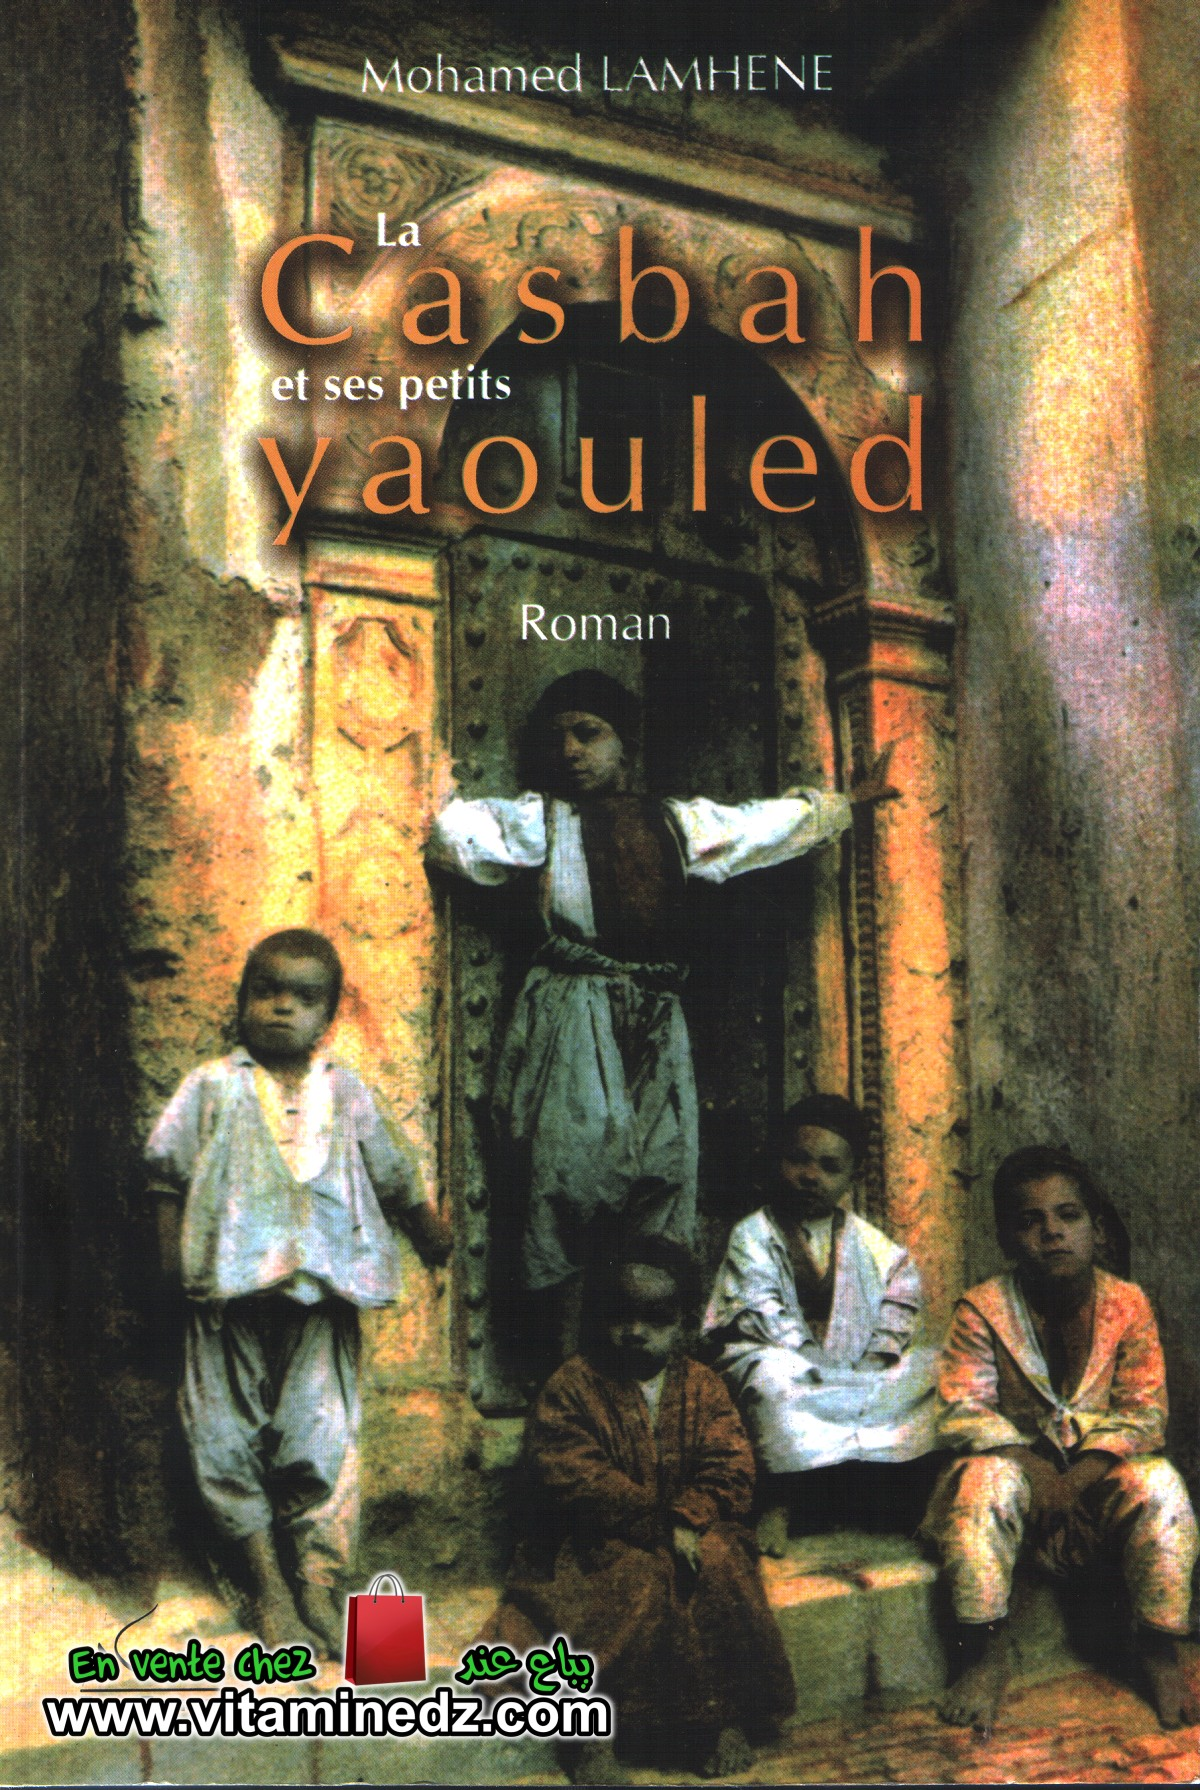 Mohamed Lamhene - La Casbah et ses petits Yaouled